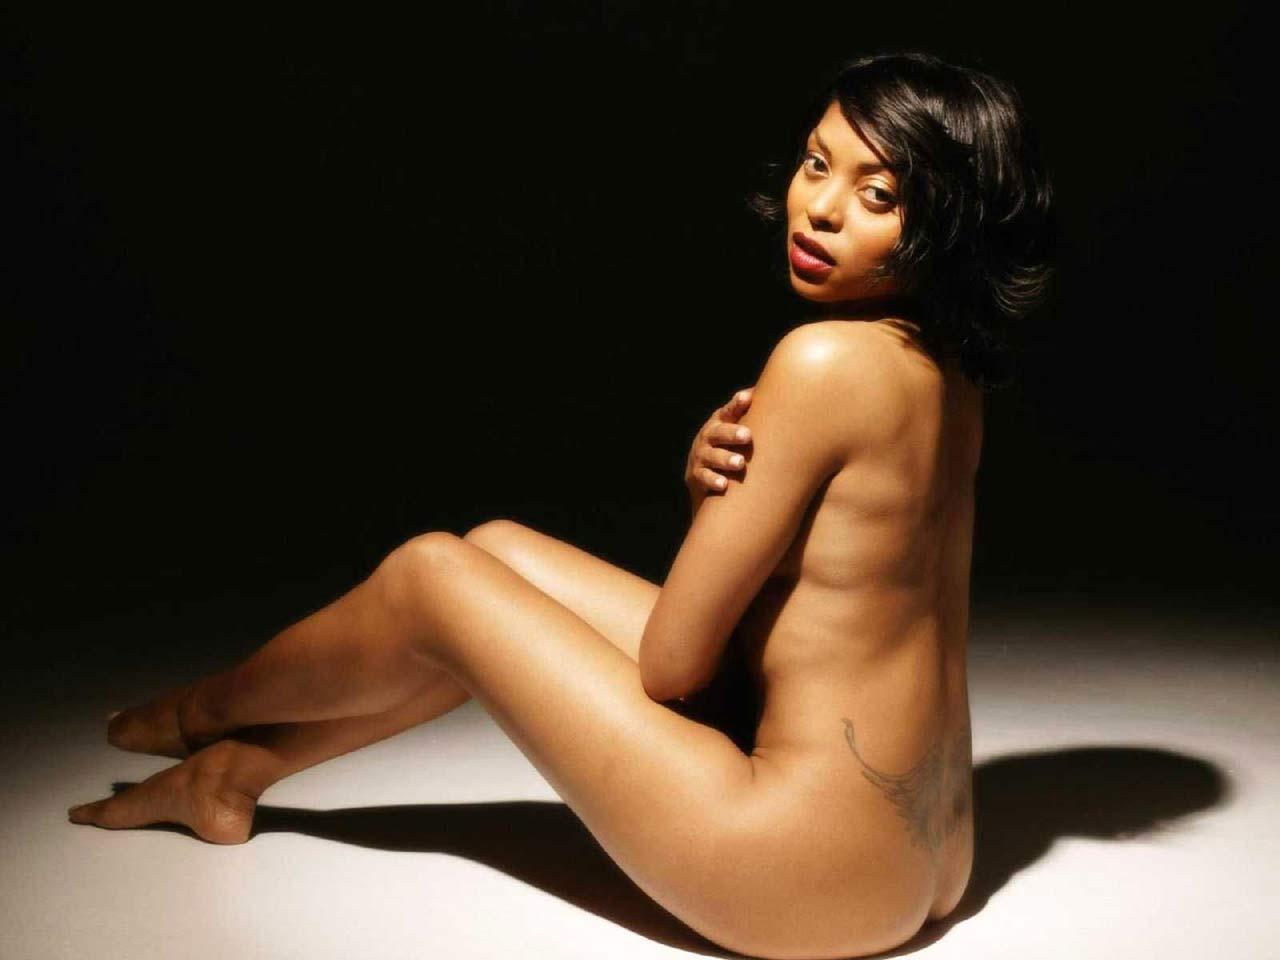 Nude pics of taraji p henson